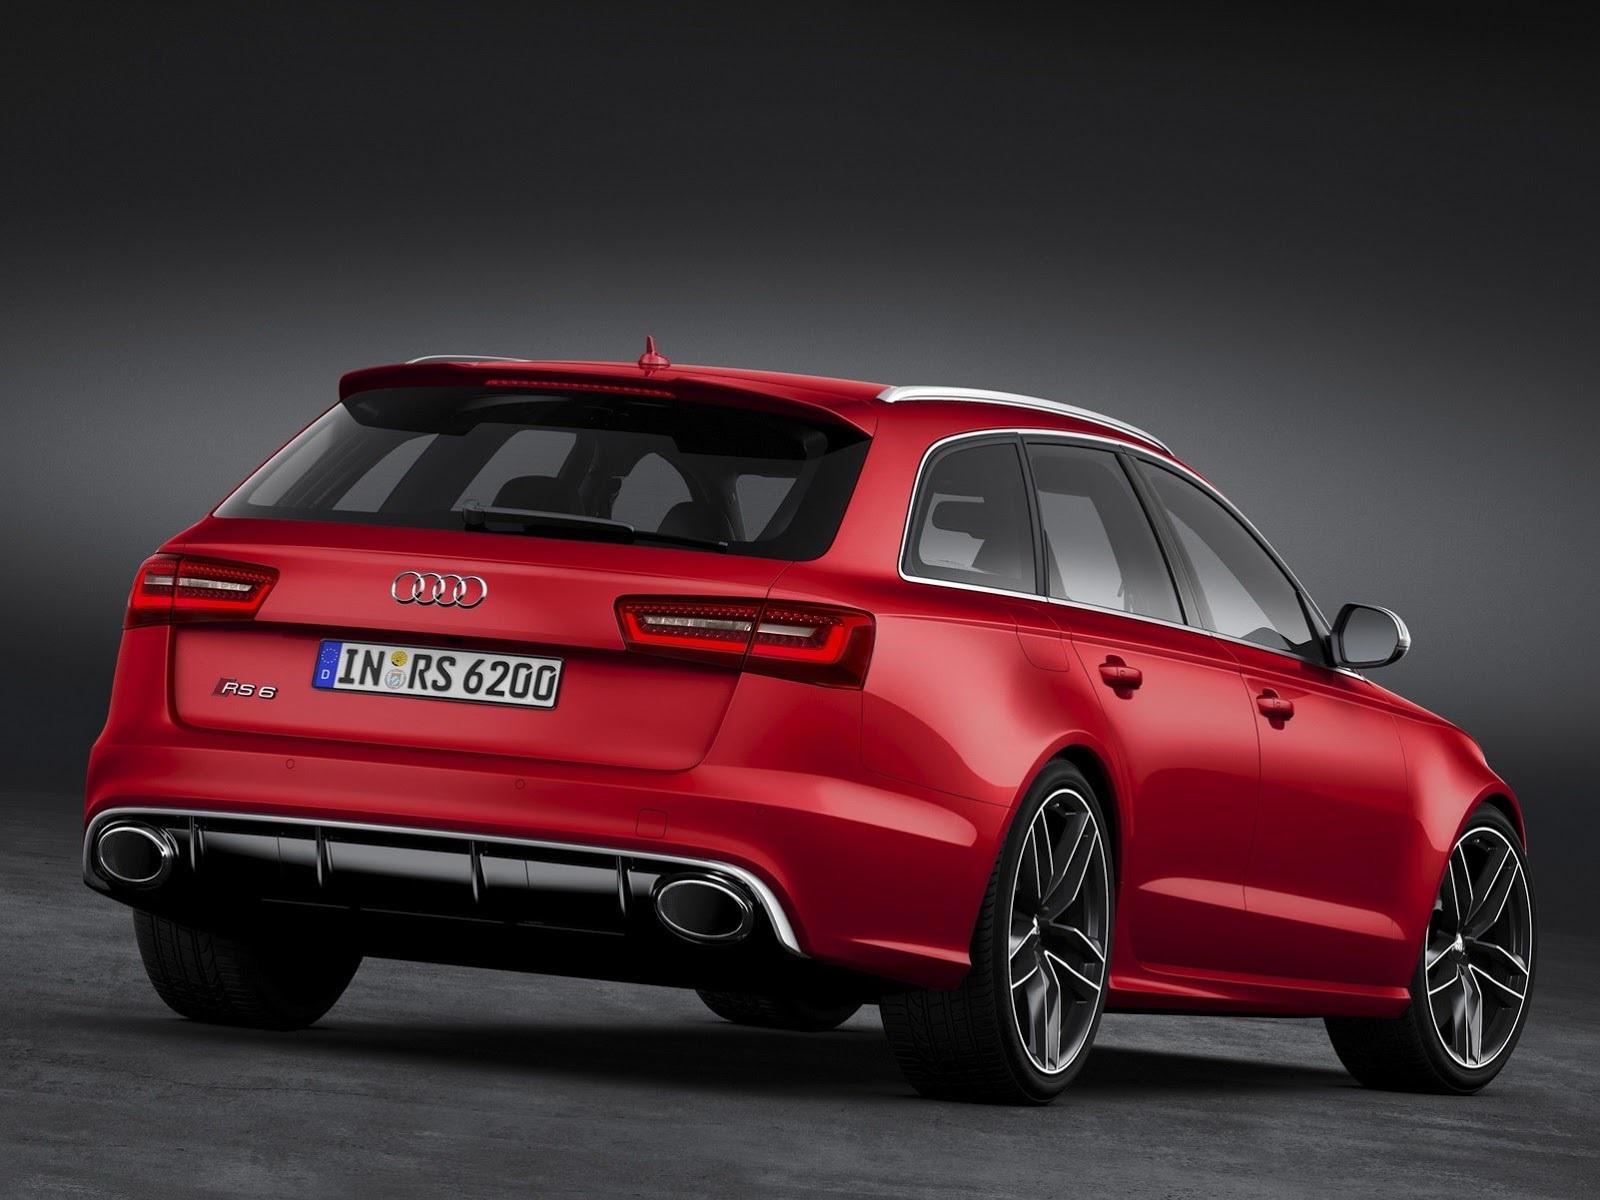 Foto de Audi RS6 Avant 2013 (5/8)